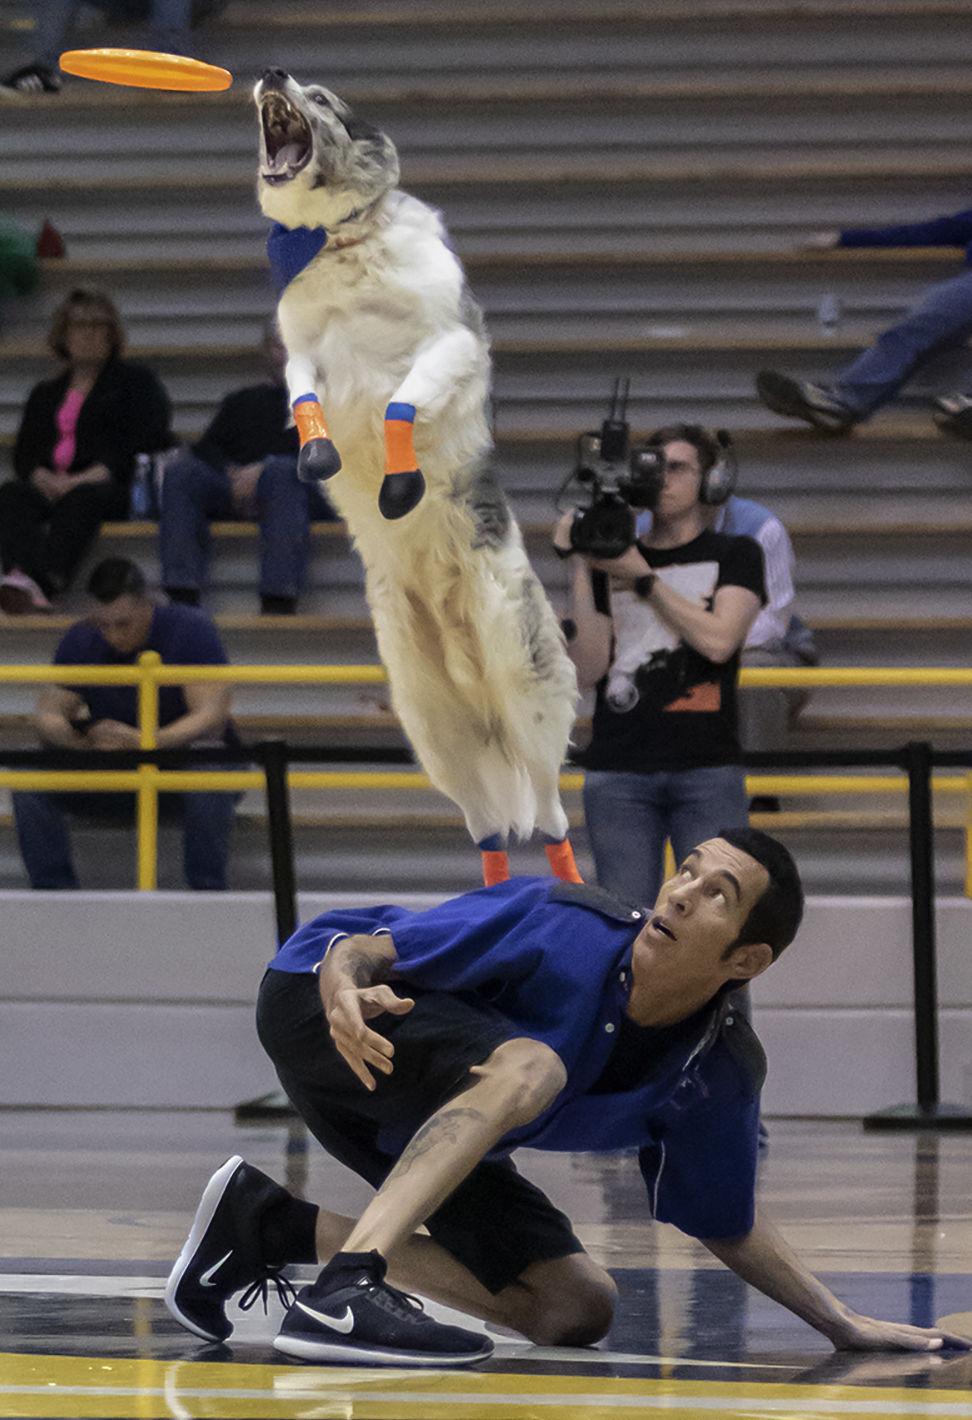 The Flying Houndz Frizbee